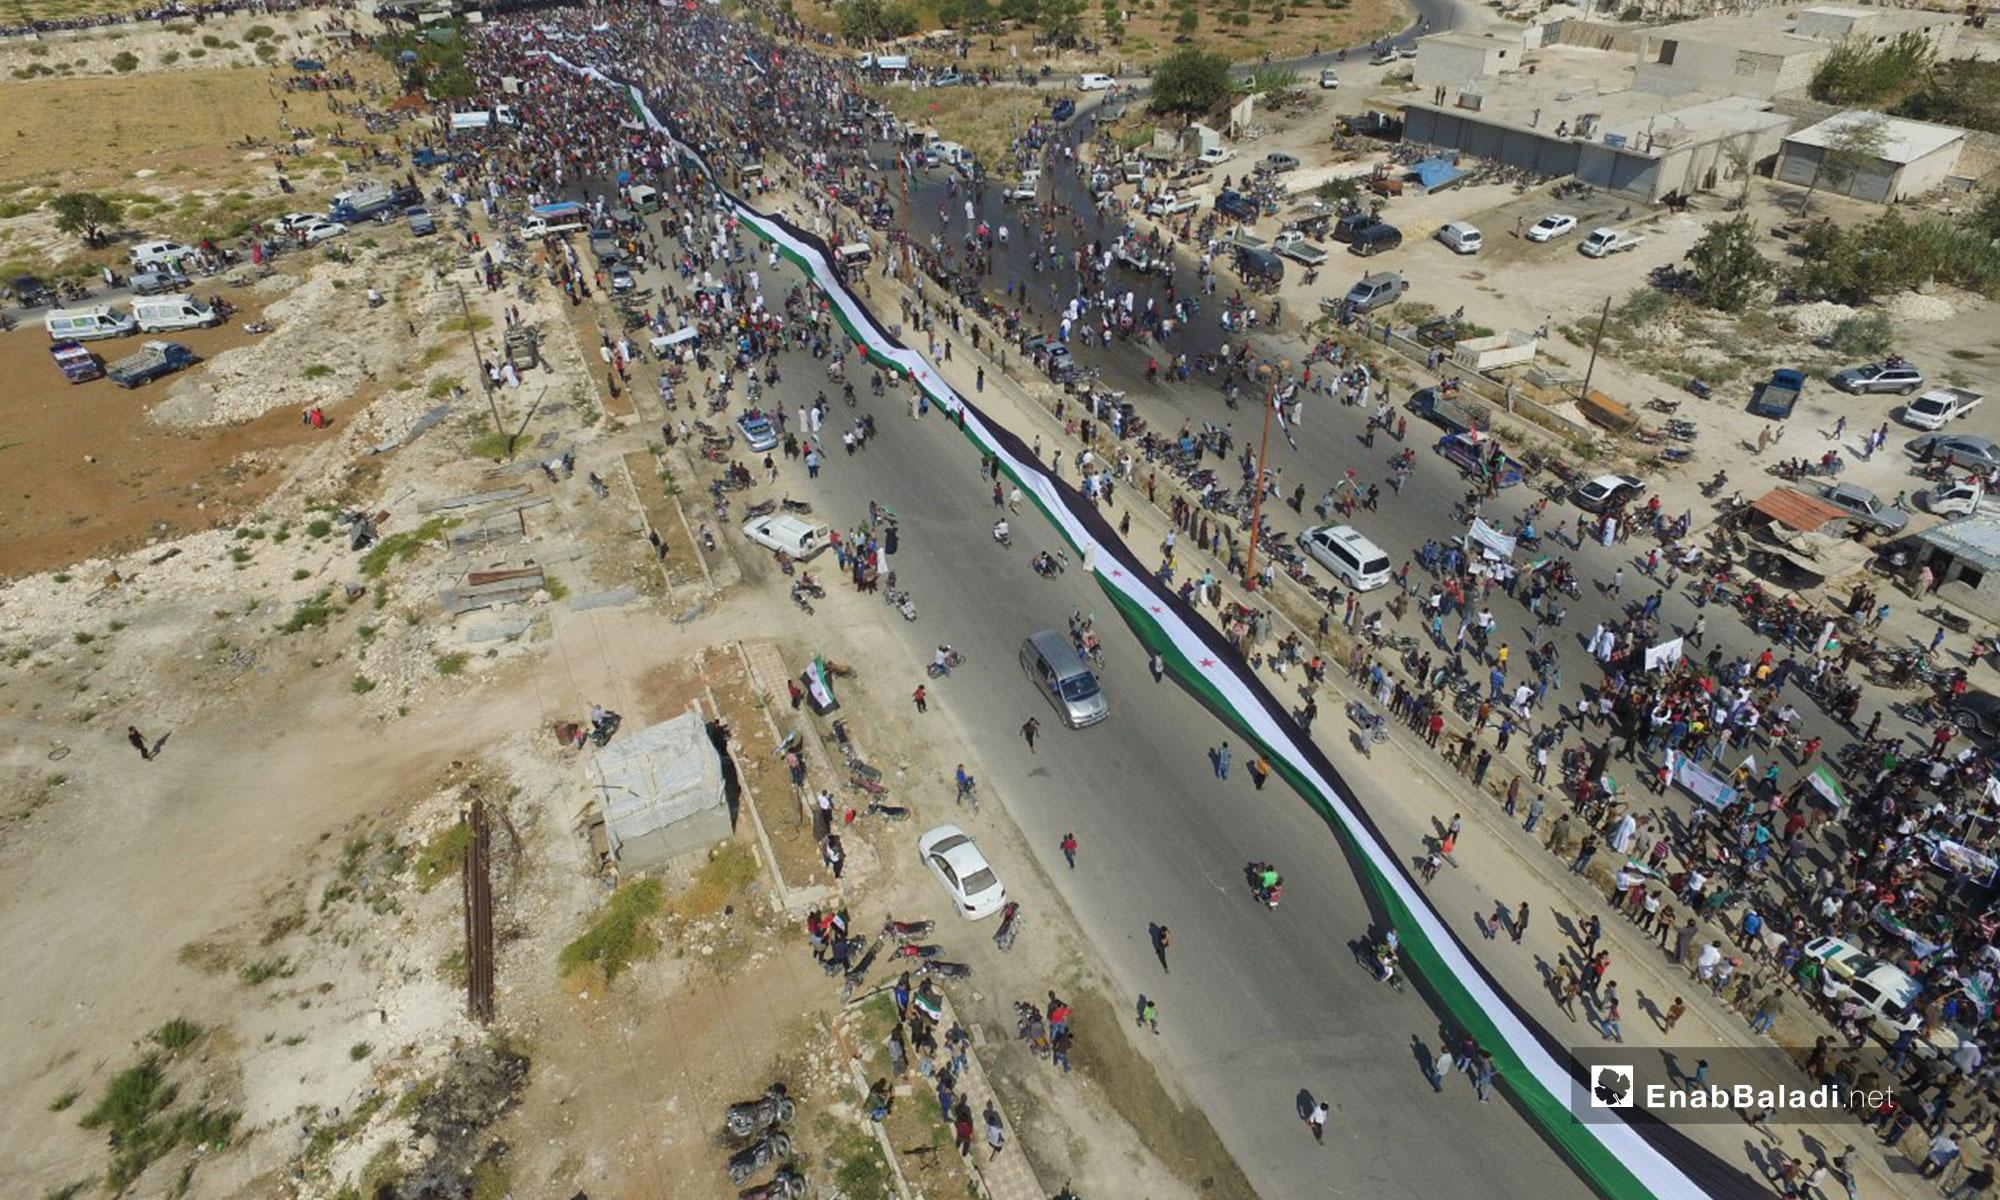 Demonstrations demanding the reignition of the revolution in Maarrat al-Nu